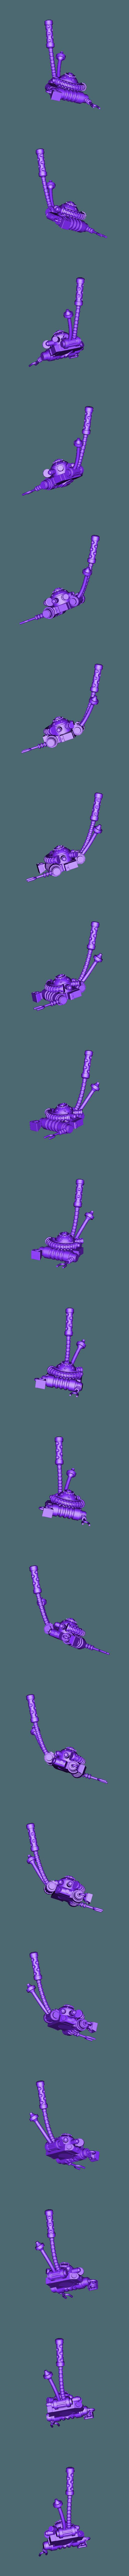 Ranger_4.1_-_Backpack.stl Download free STL file Martian Mechanized Rangers • 3D printable object, ErikTheHeretek